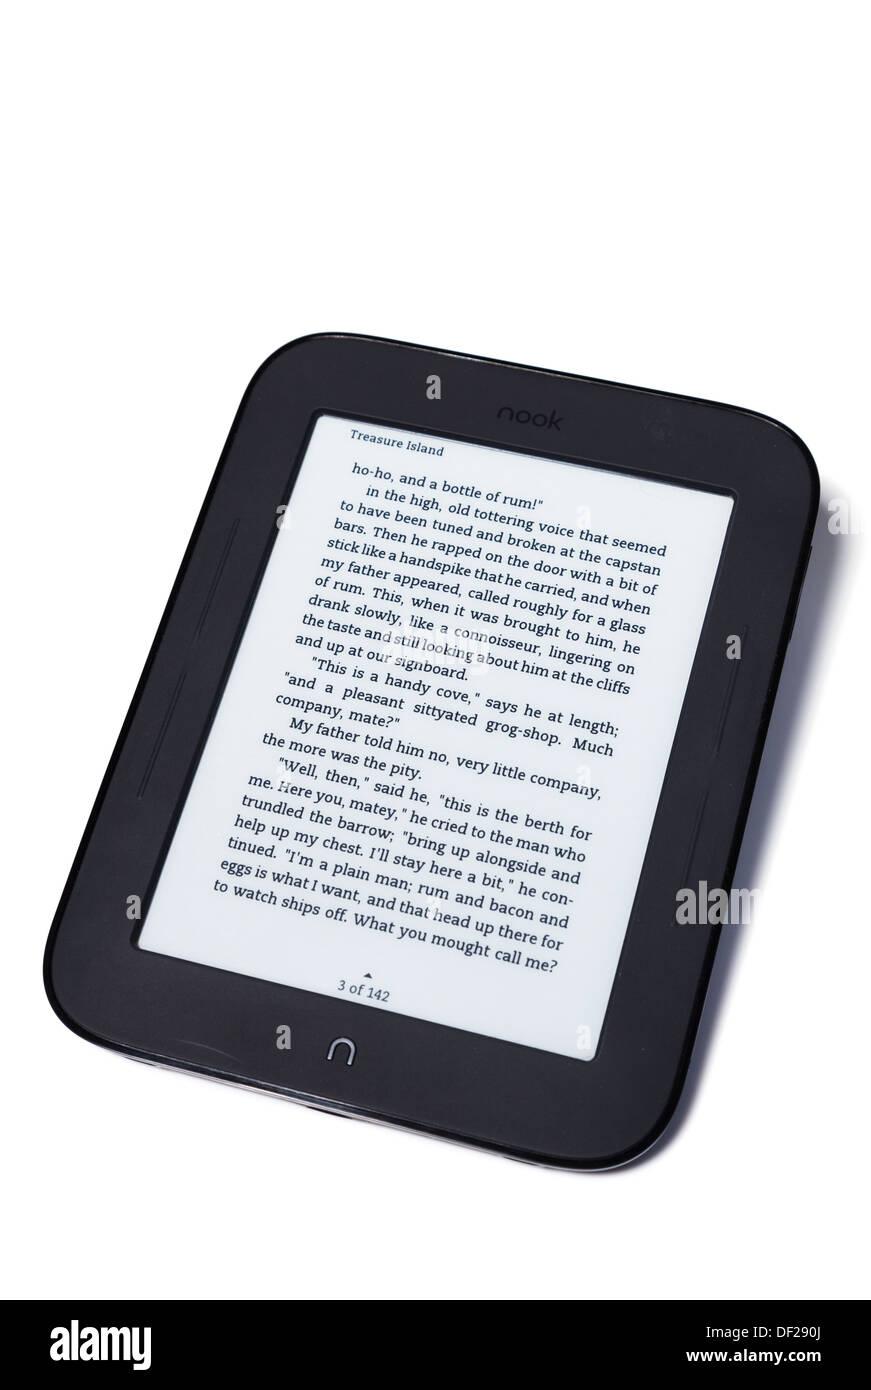 Studio nook e-reader on white Photo Stock